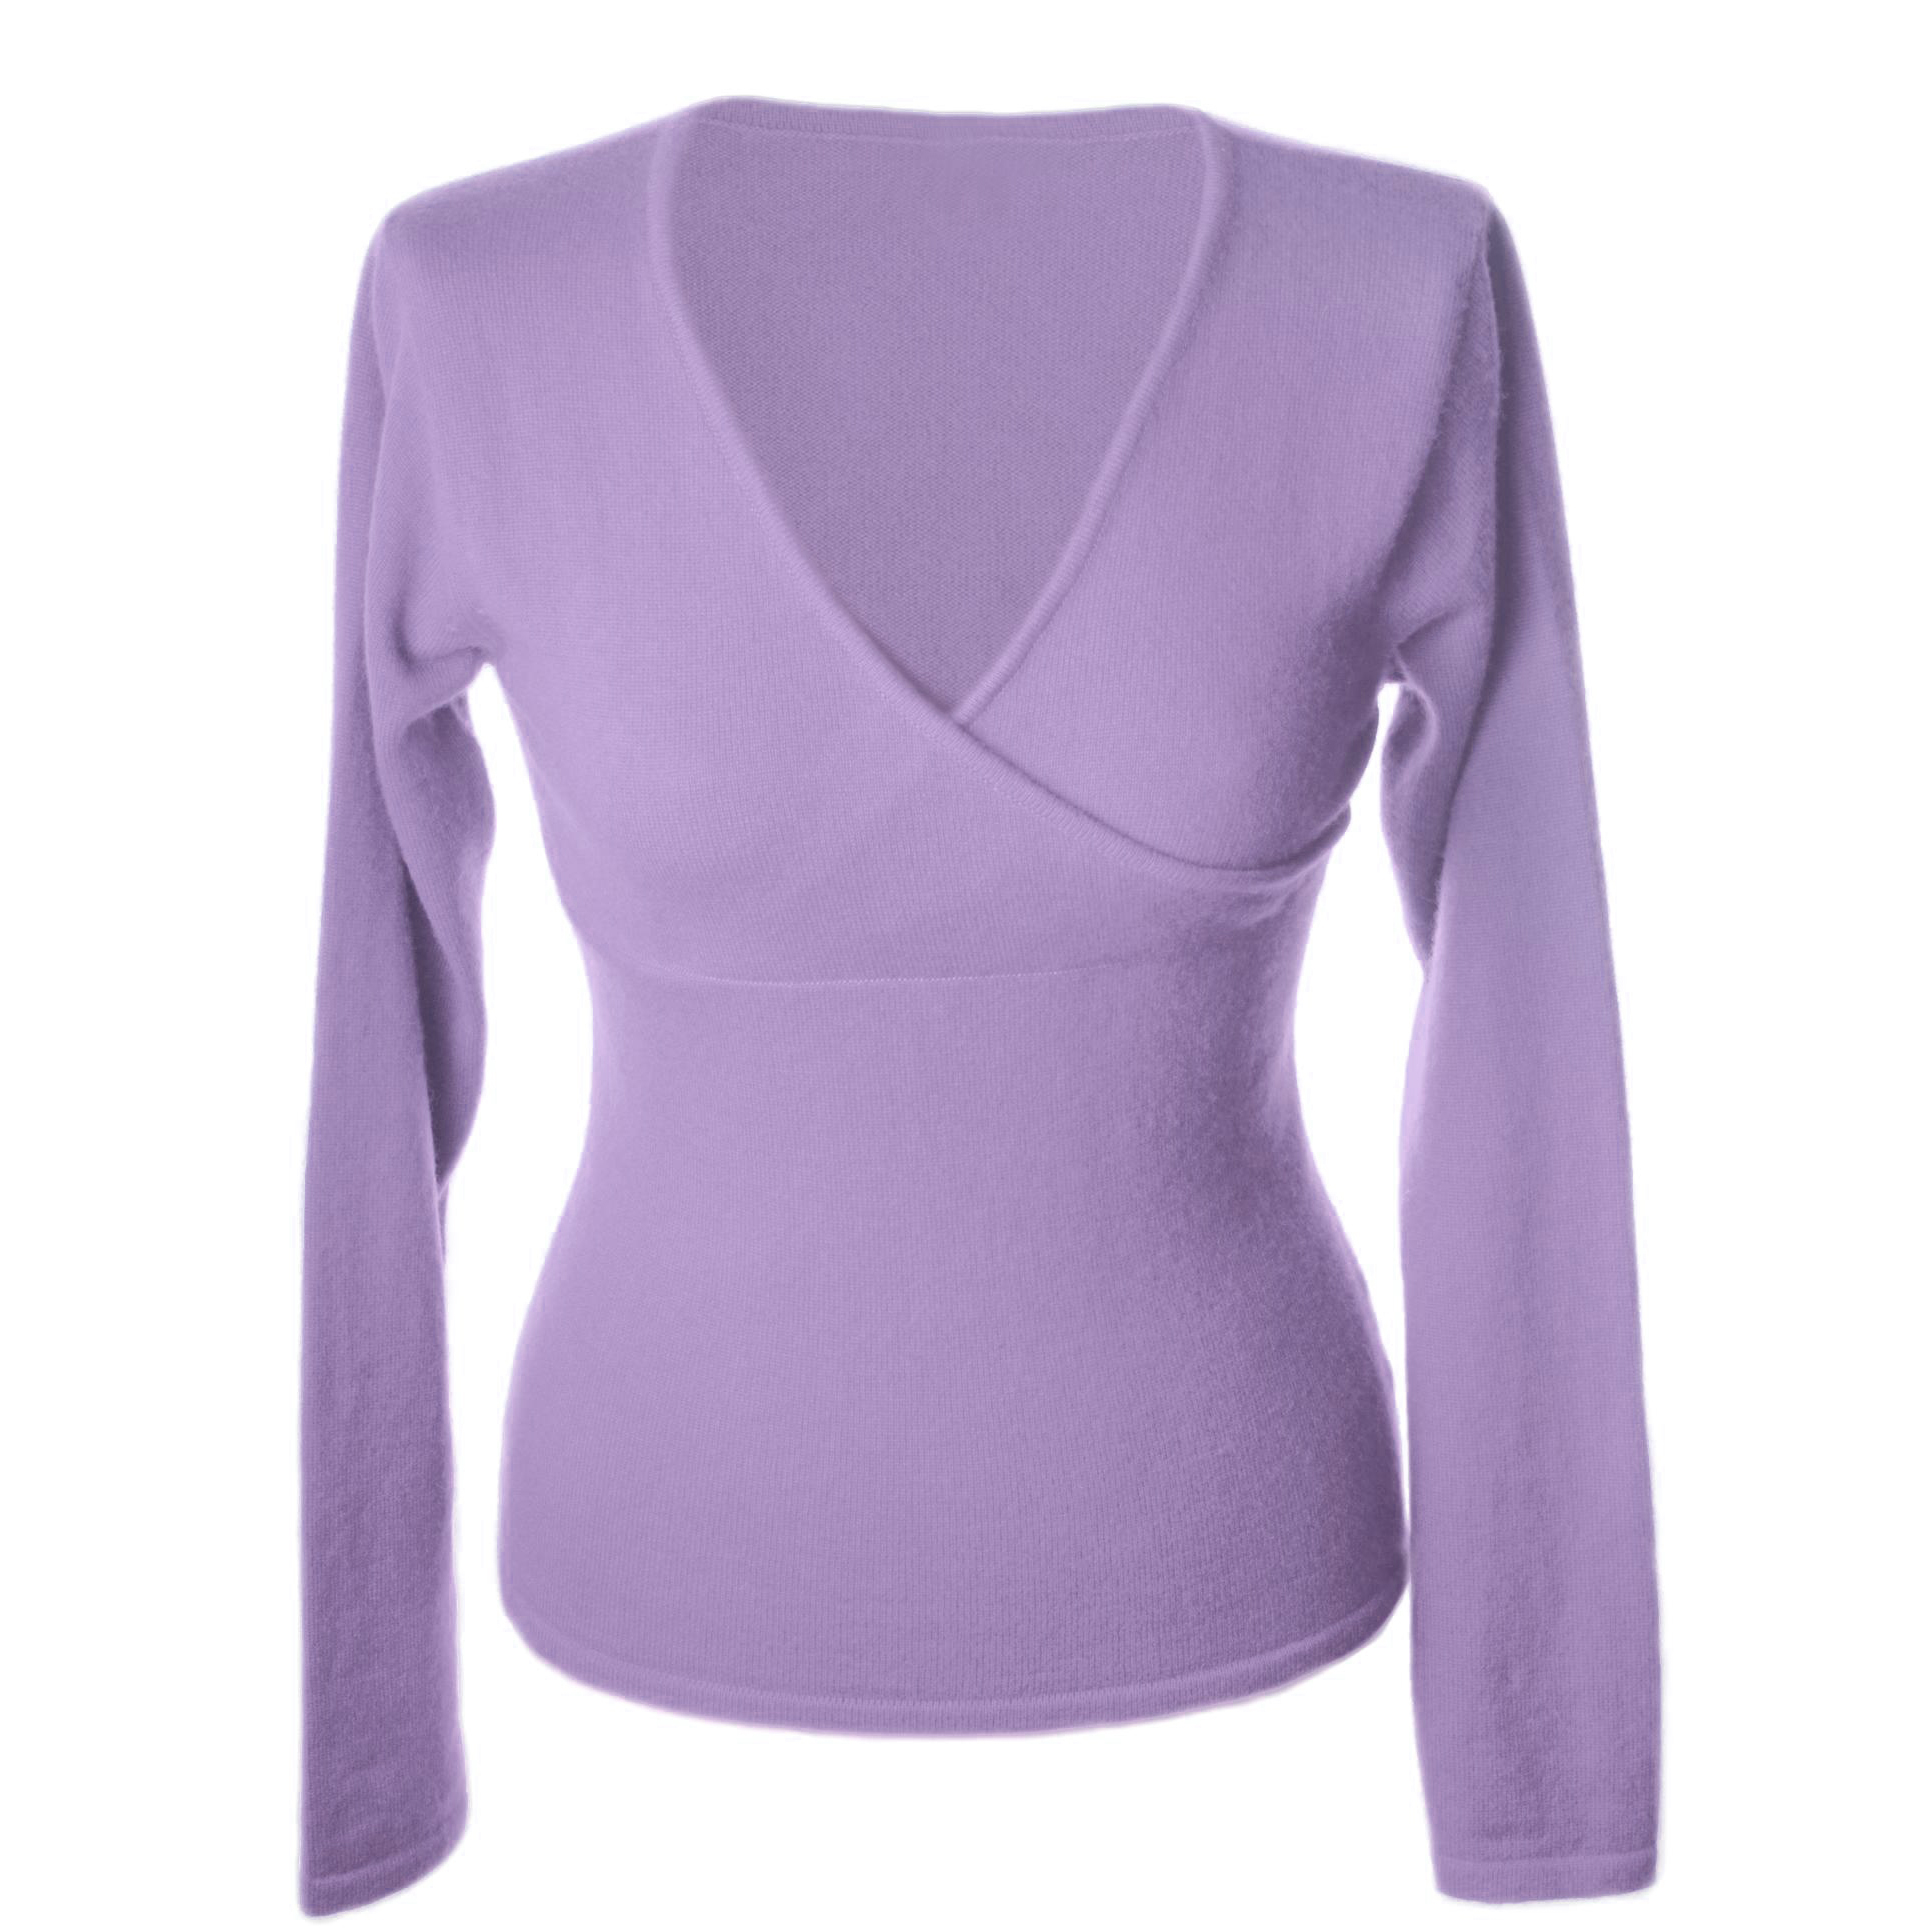 Ladies Longsleeve Crossover Top - Medium - Purple Heather